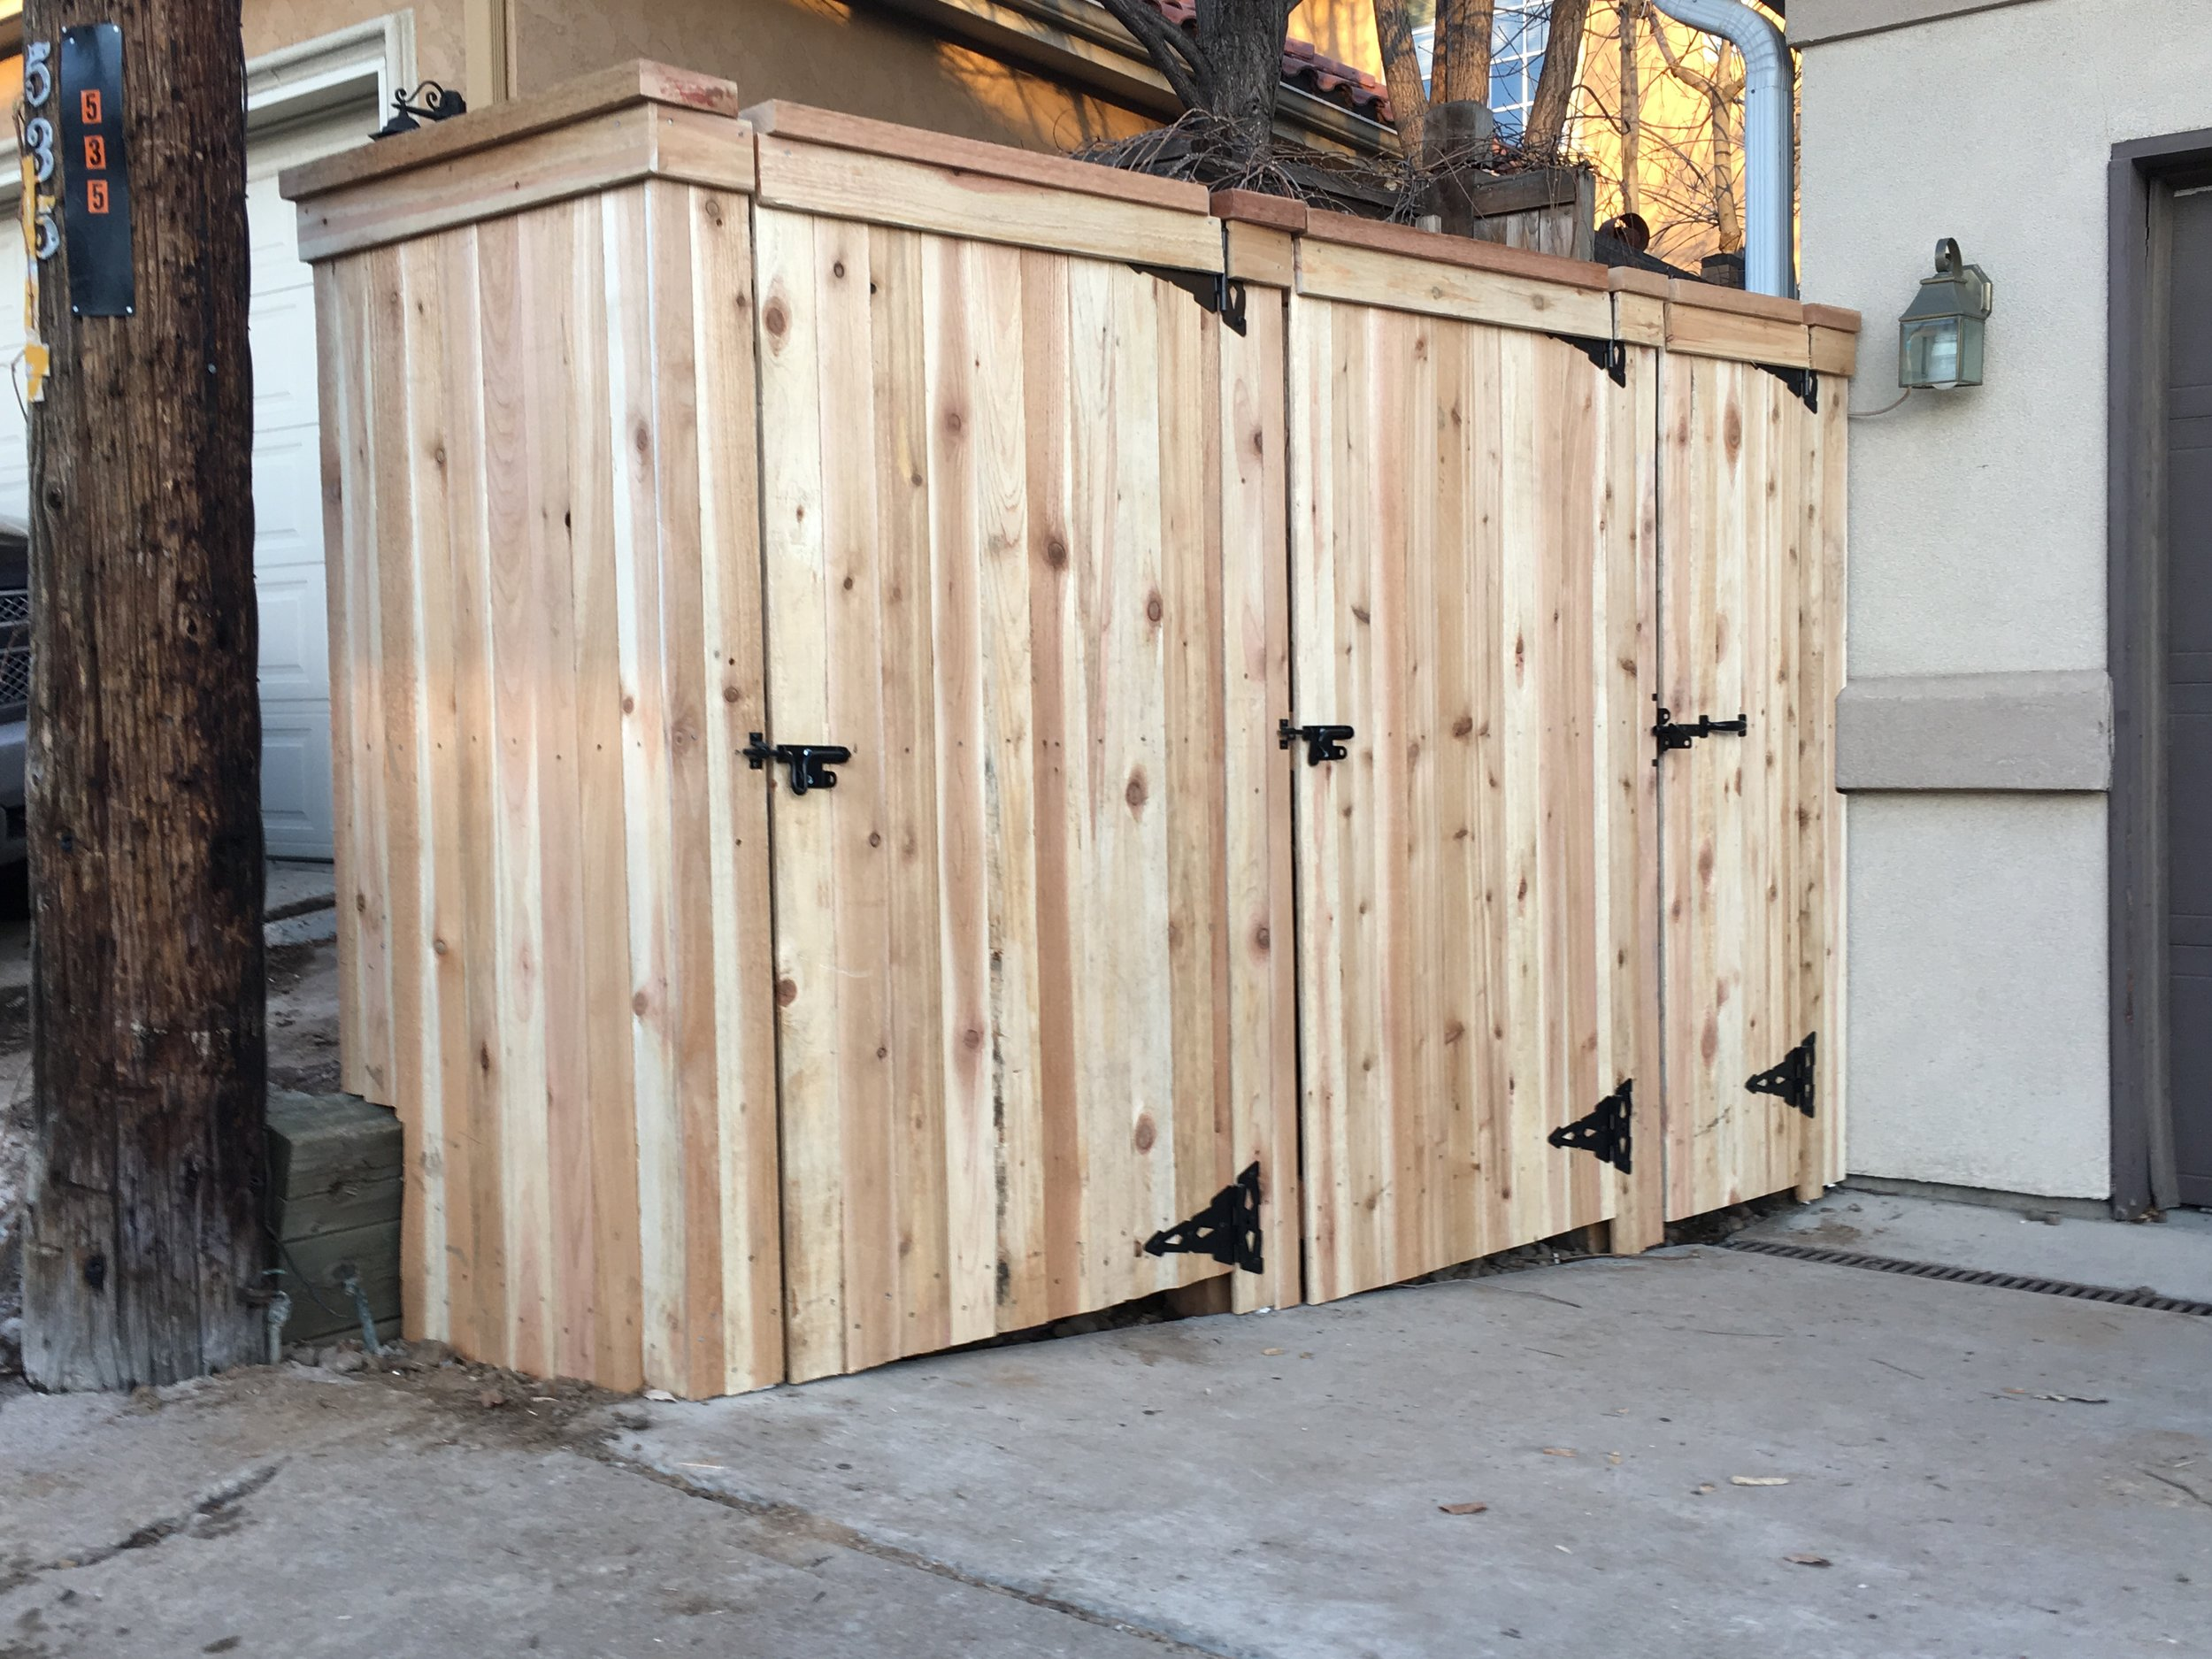 Residential trash enclosure